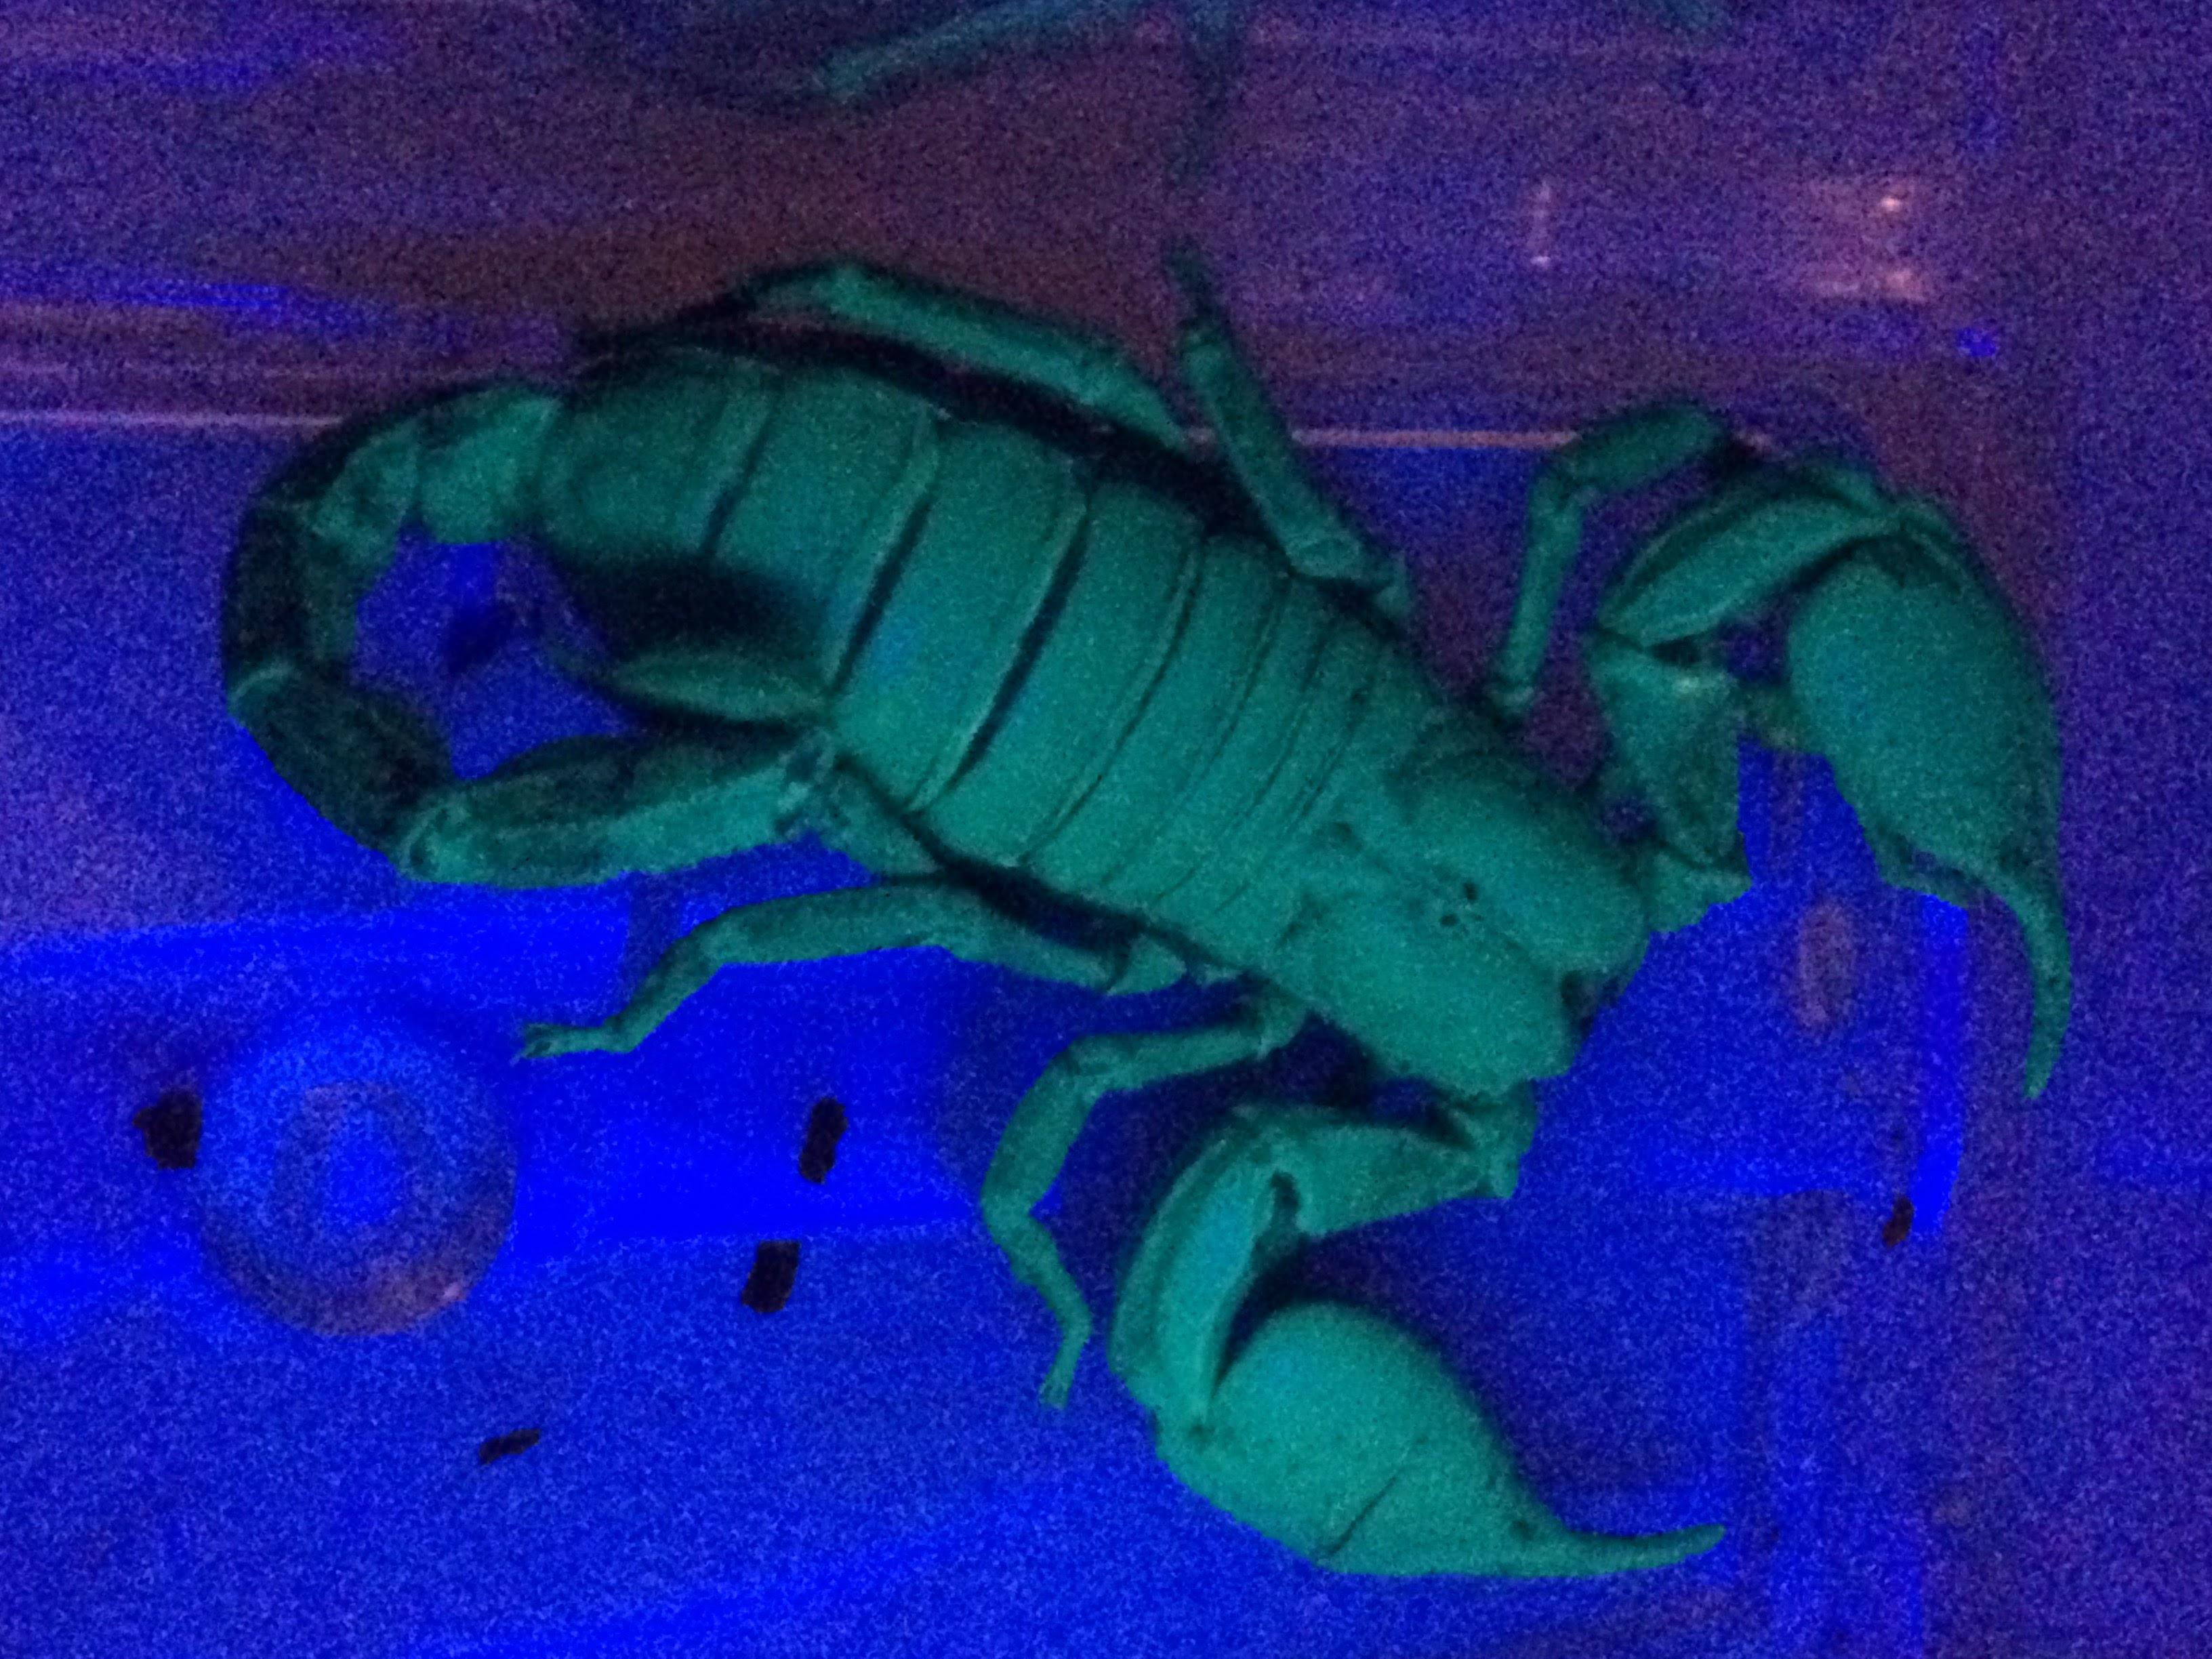 Simon glowing under ultraviolet